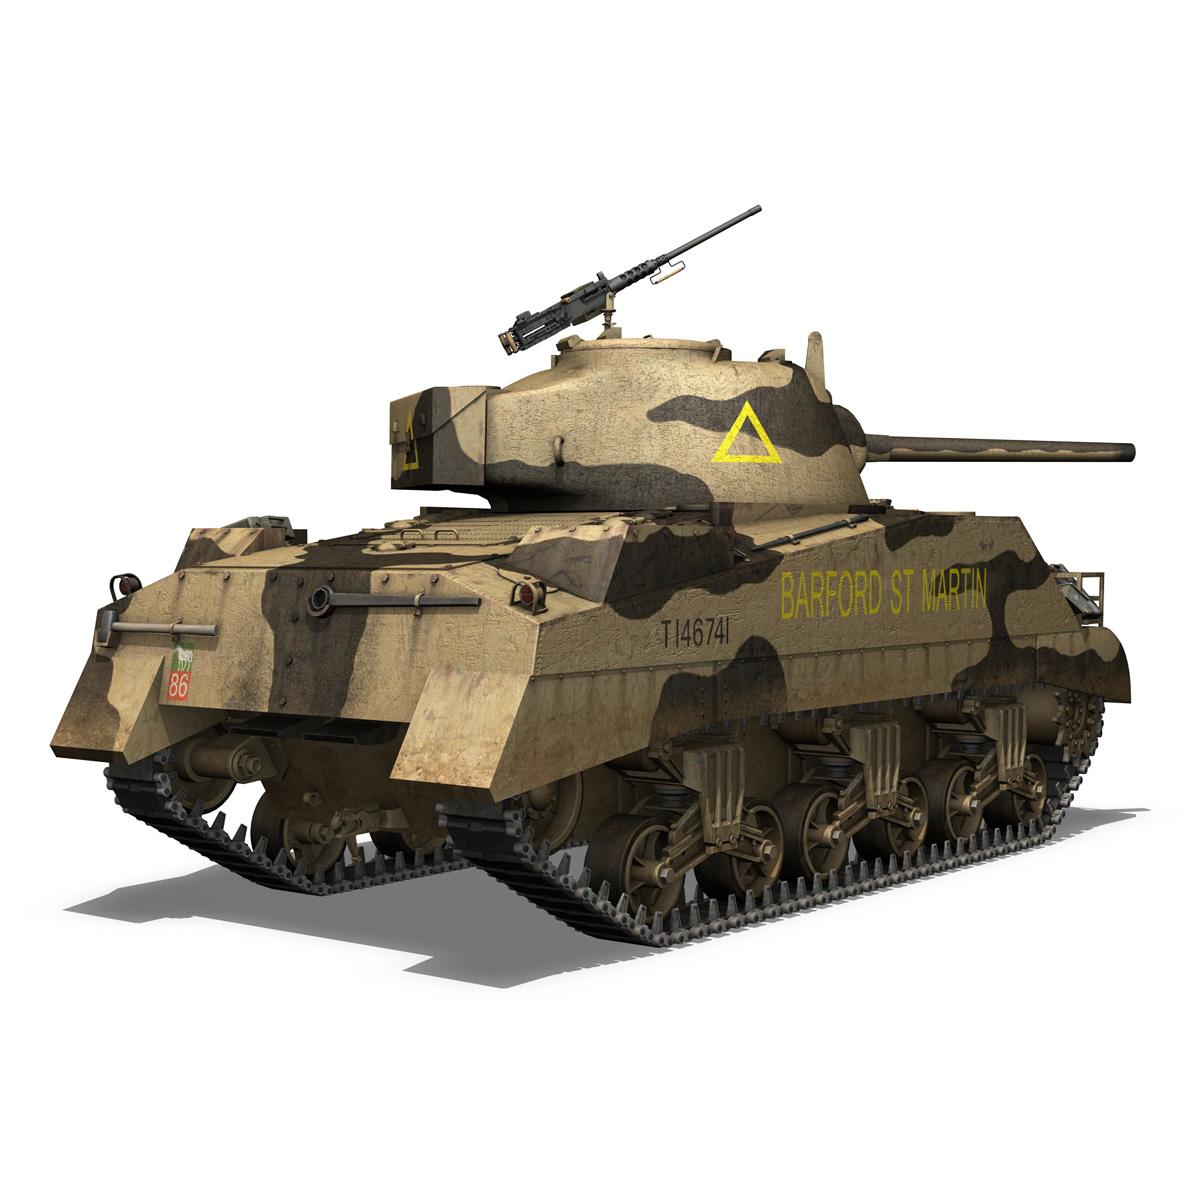 M4 Sherman MK.III - Barford St Martin 3d model  266956